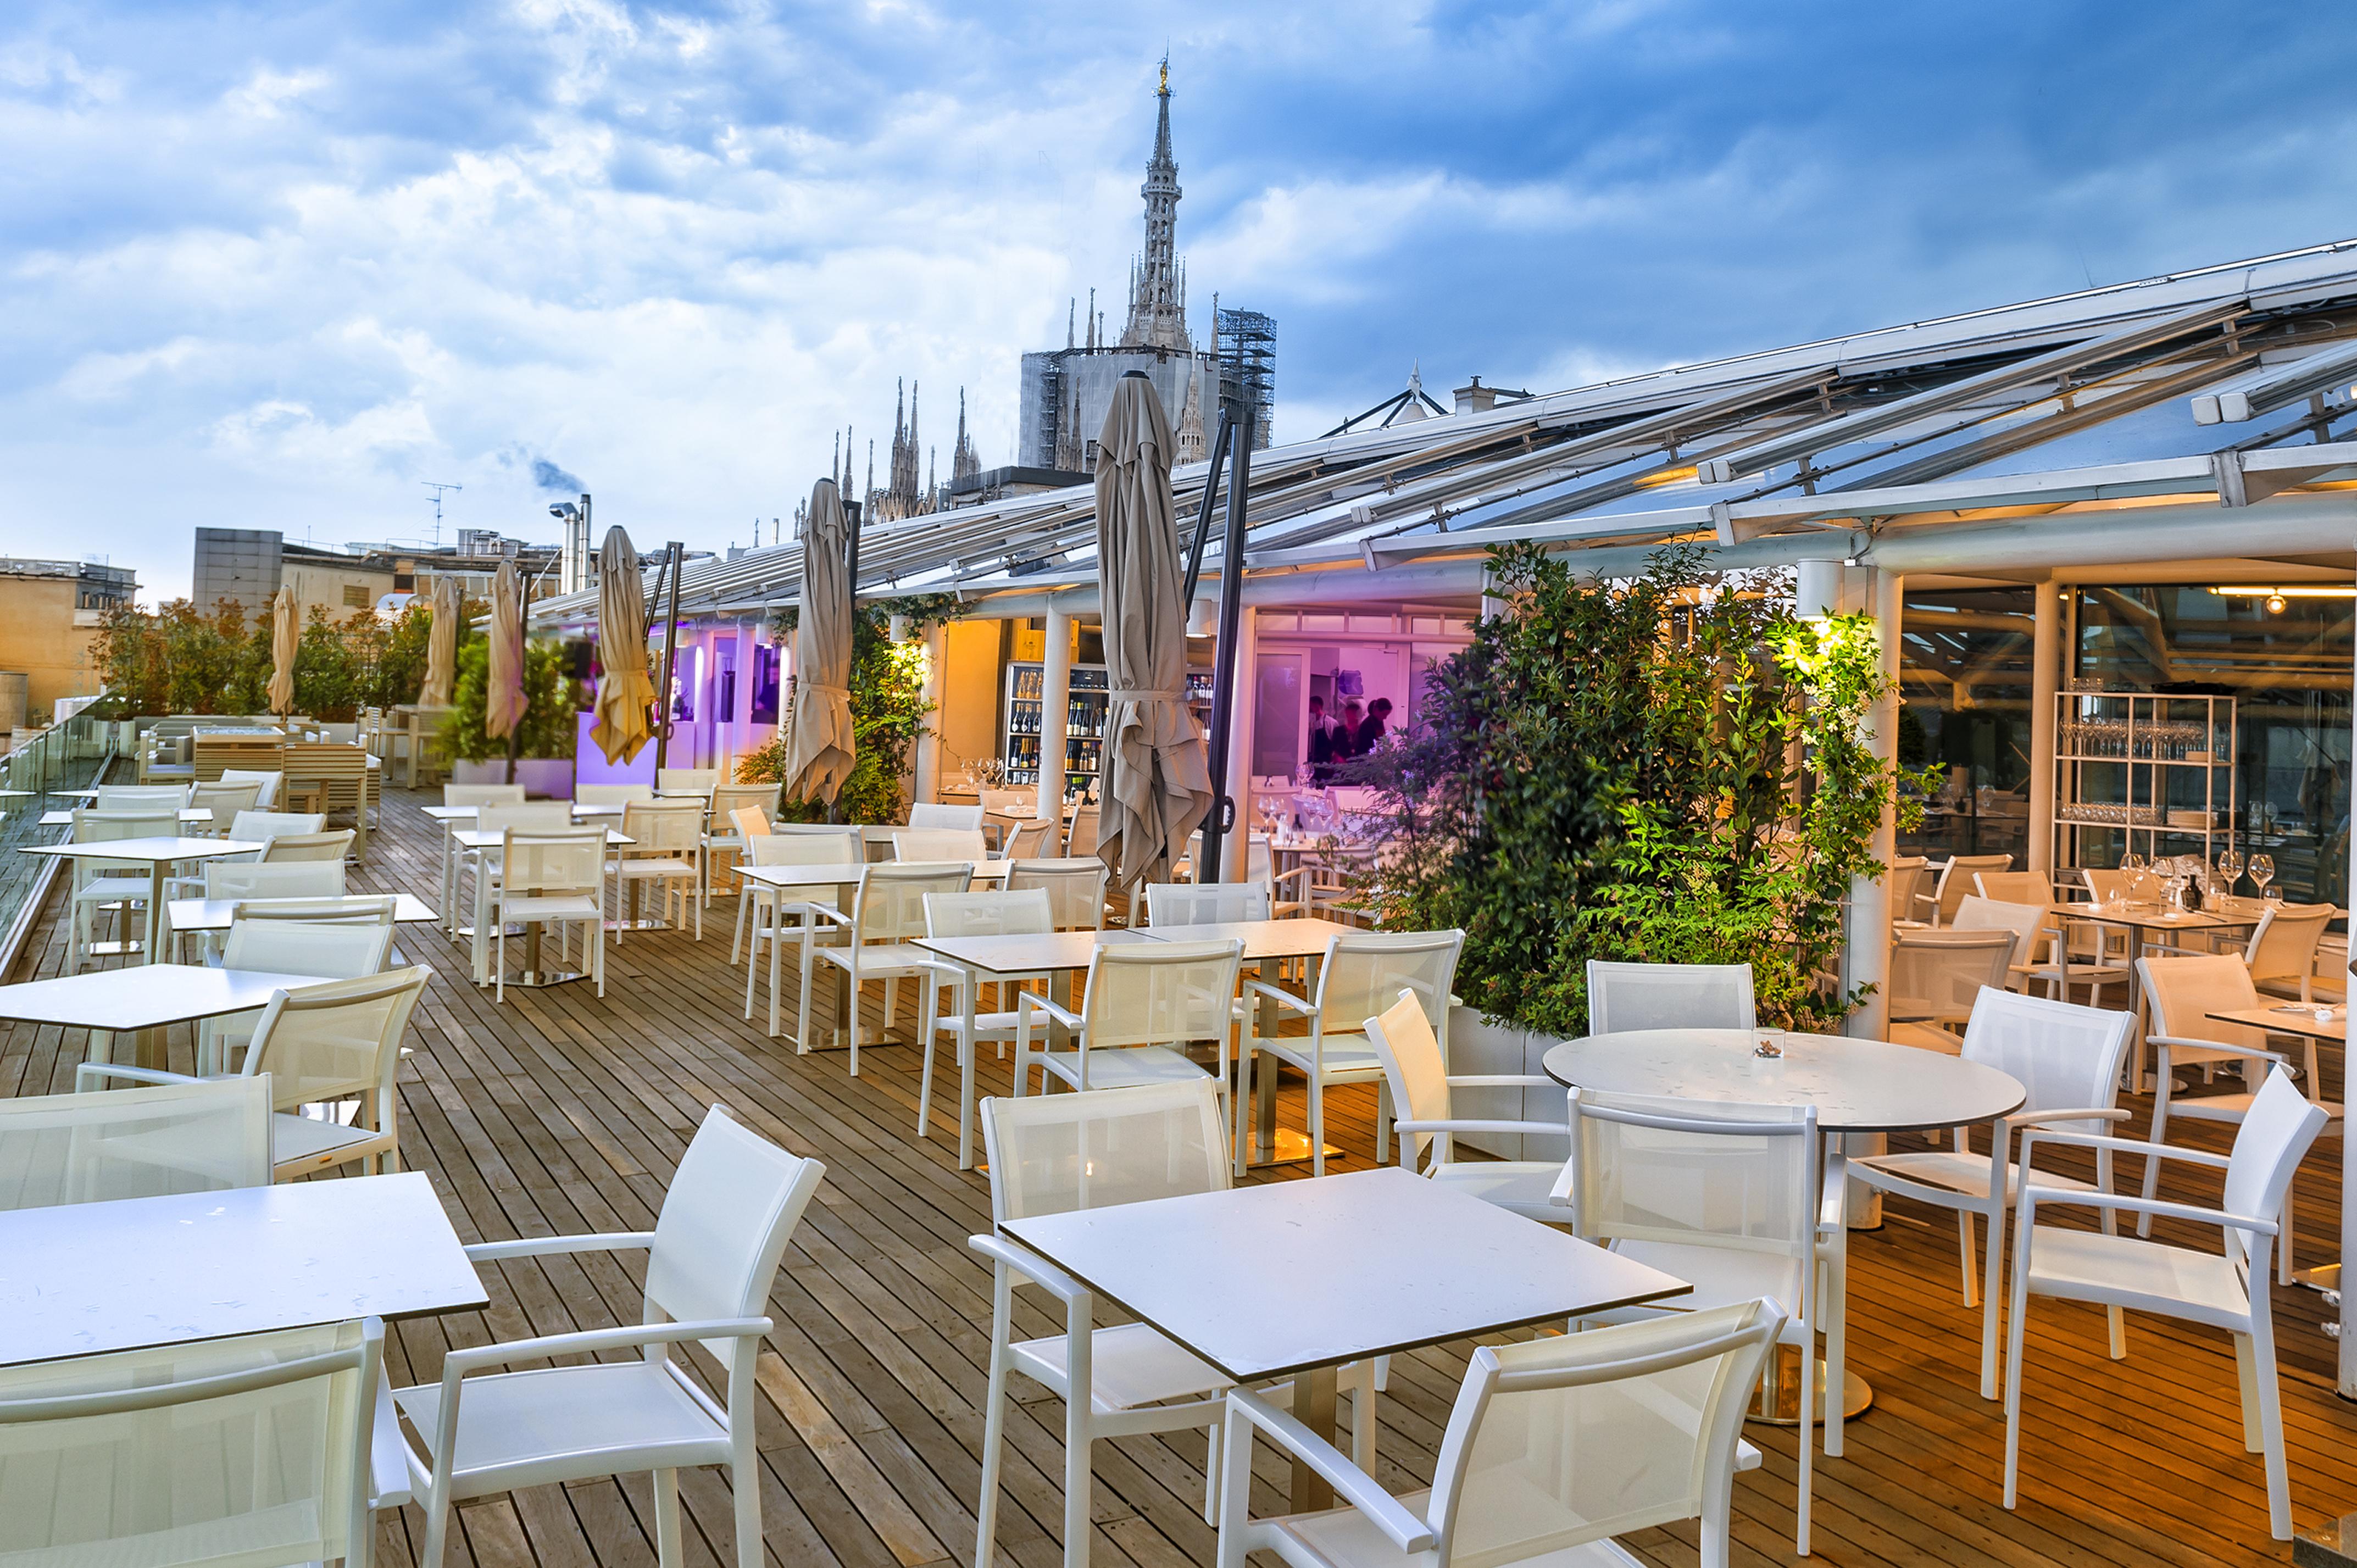 Acquolina A Taste On Top A Milano Cucina Stellata In